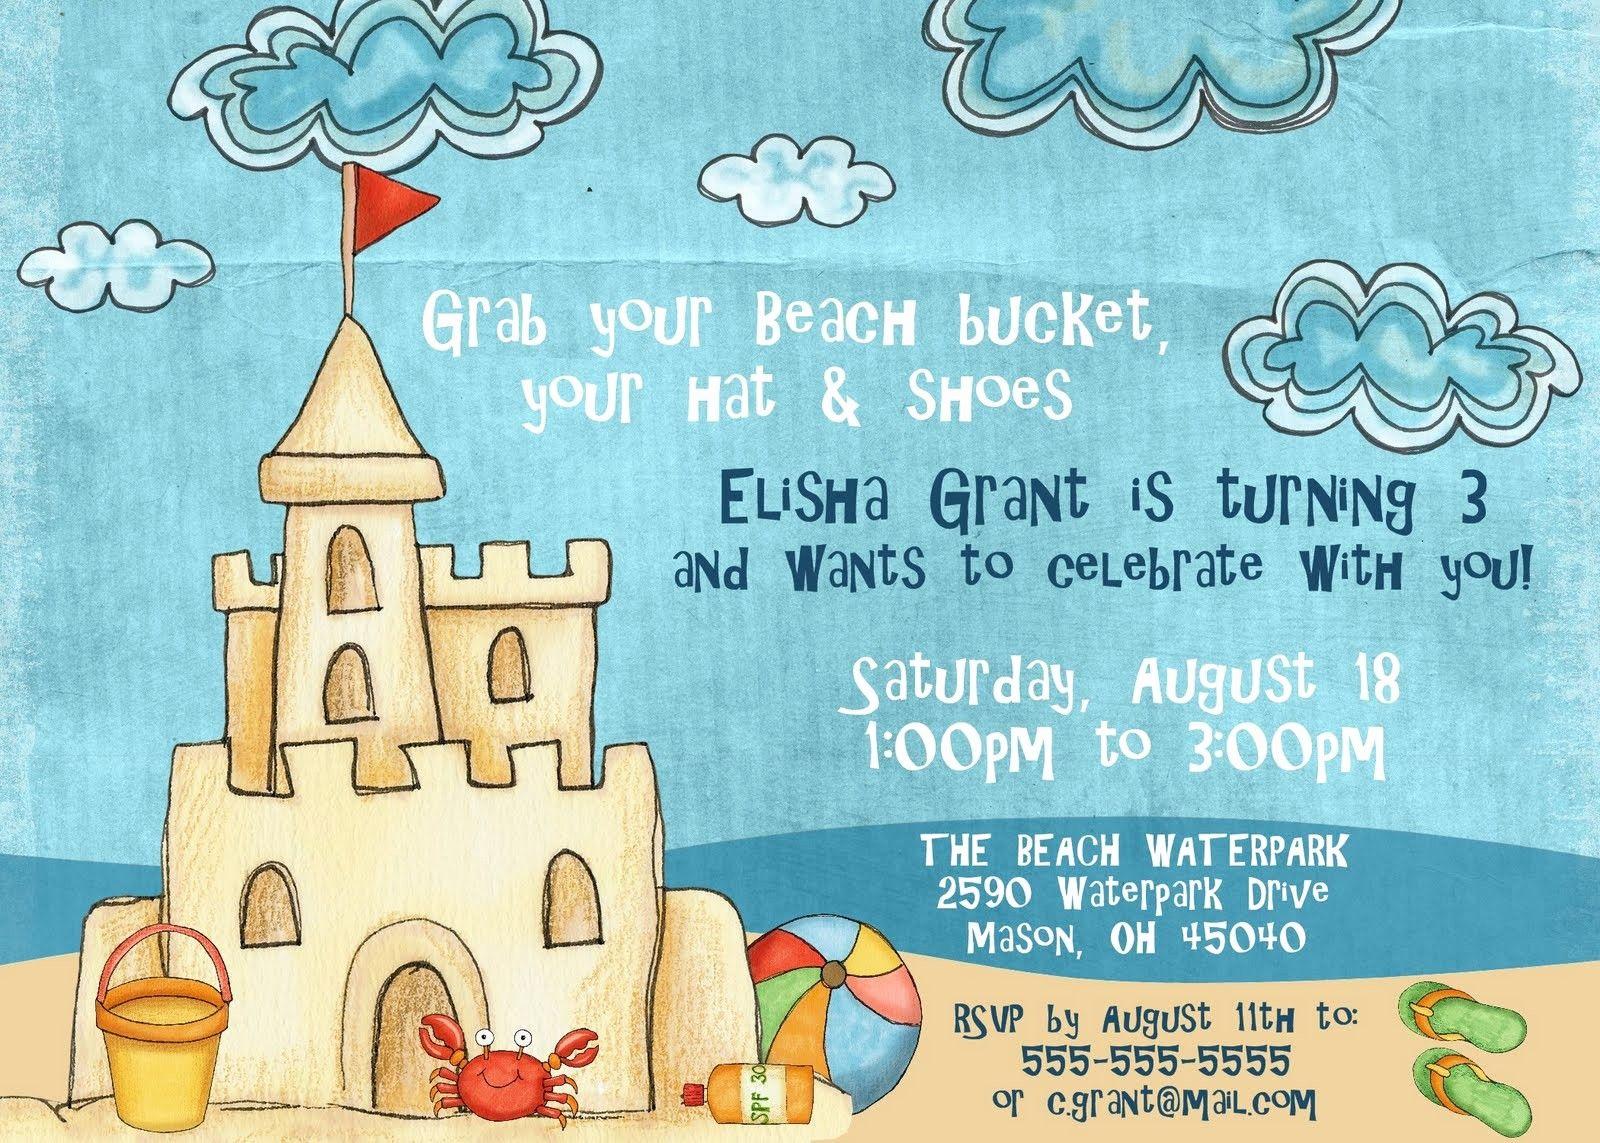 Birthday Invitation Templates Word 2003 In 2020 Beach Birthday Party Beach Birthday Invitations Beach Birthday